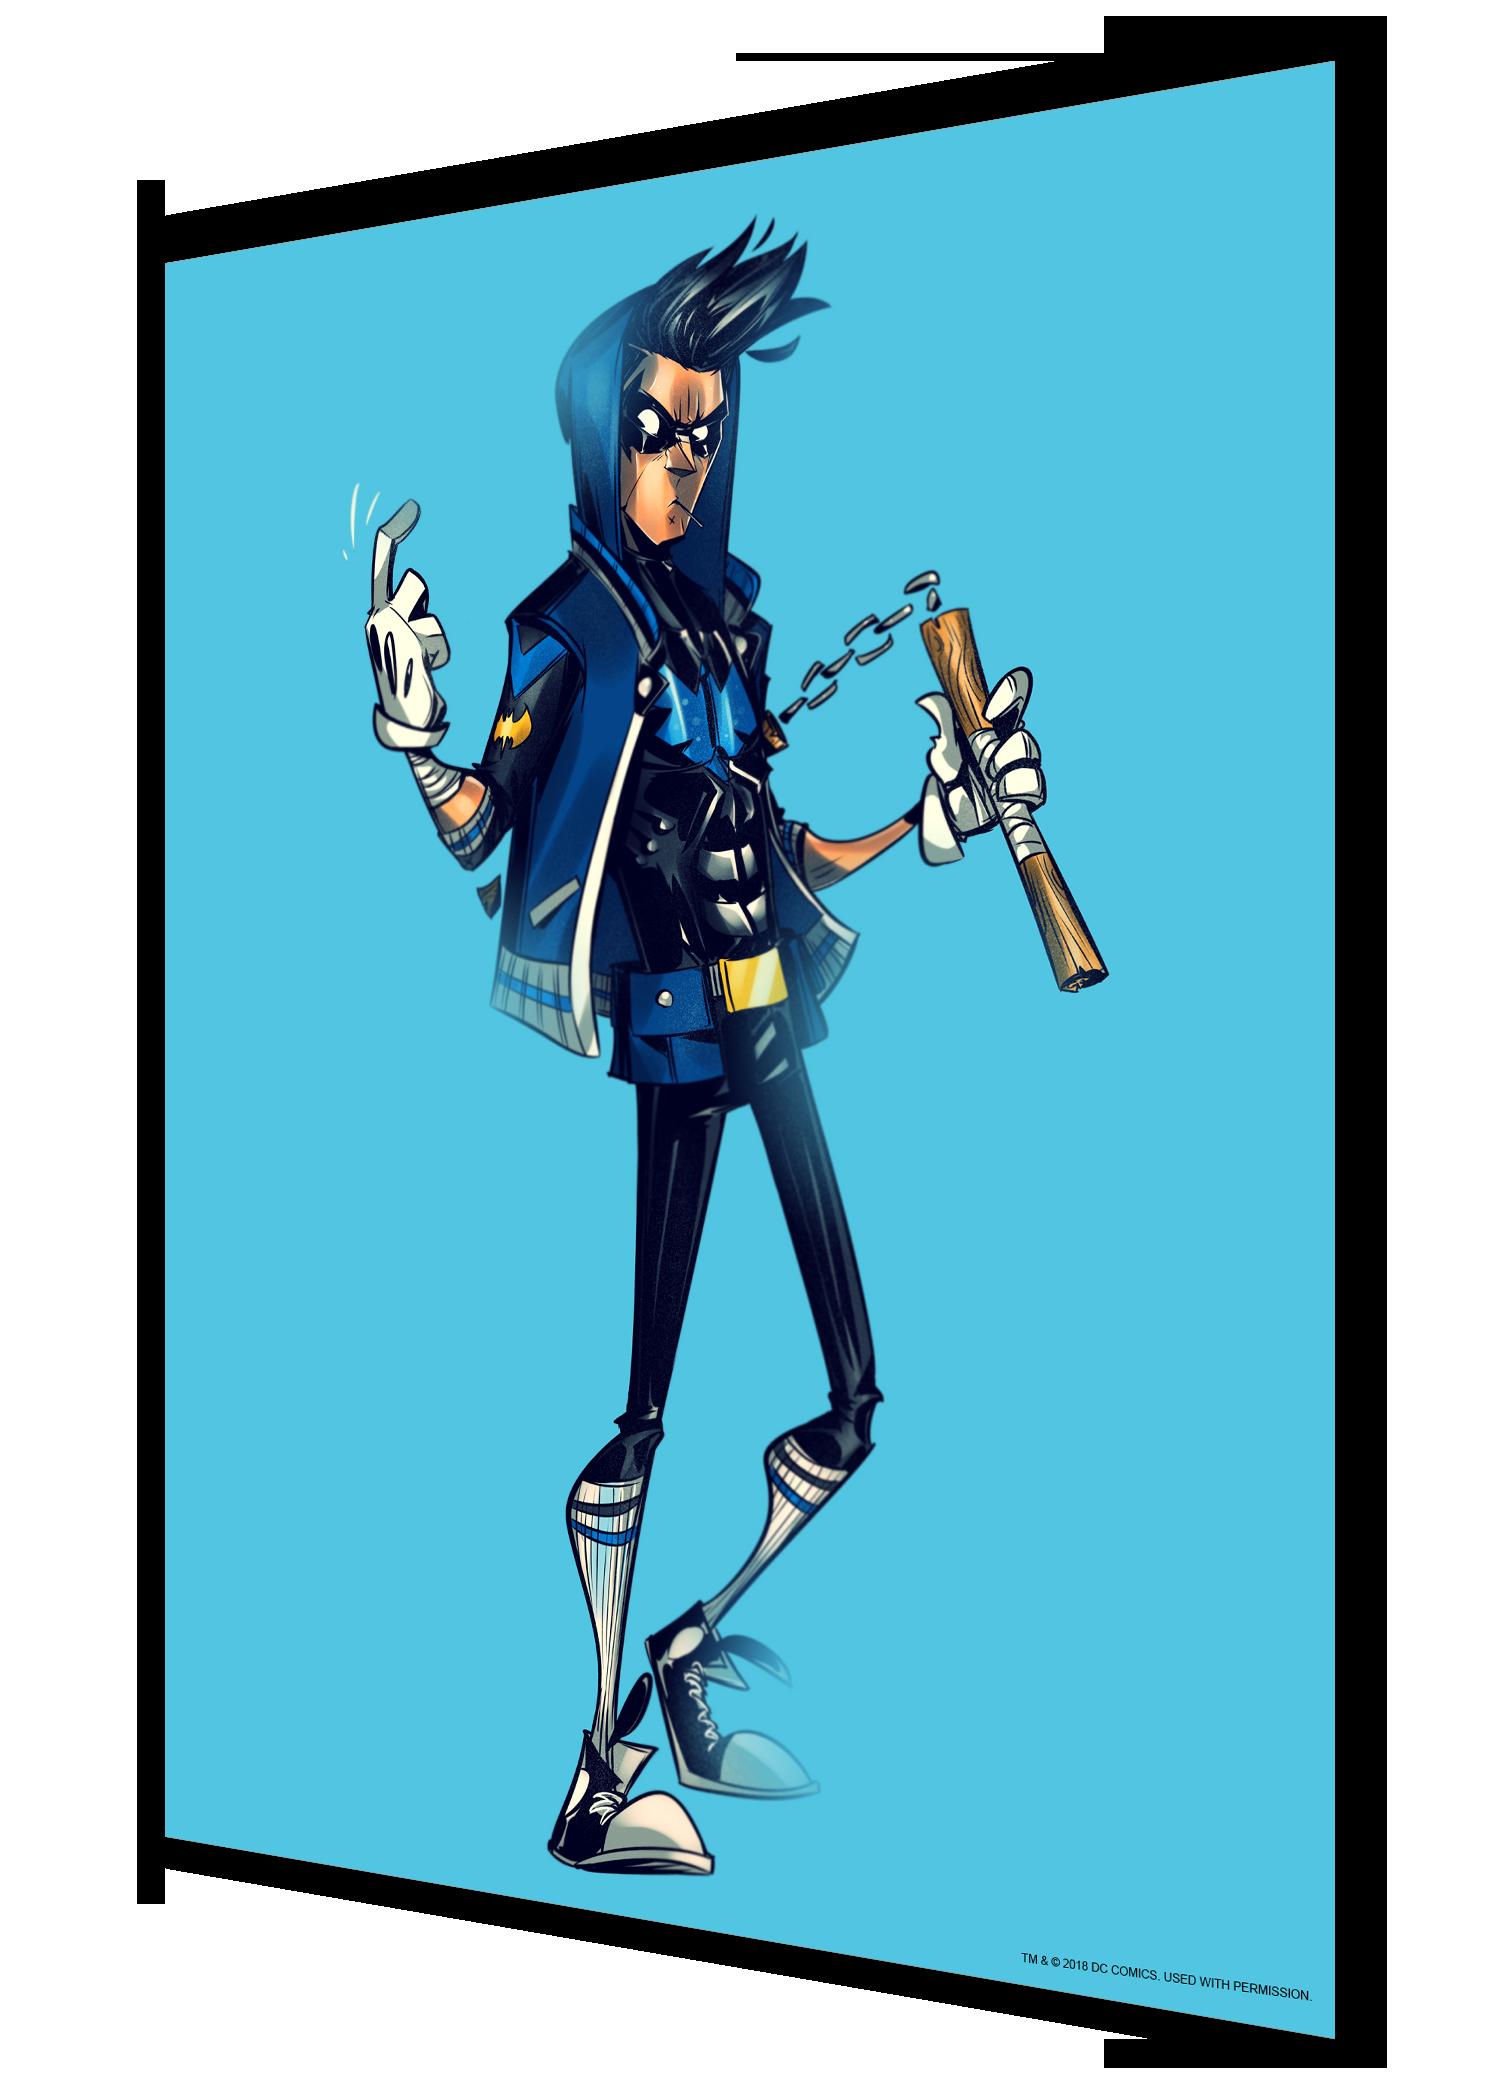 #dc18 - nightwing (super rare)